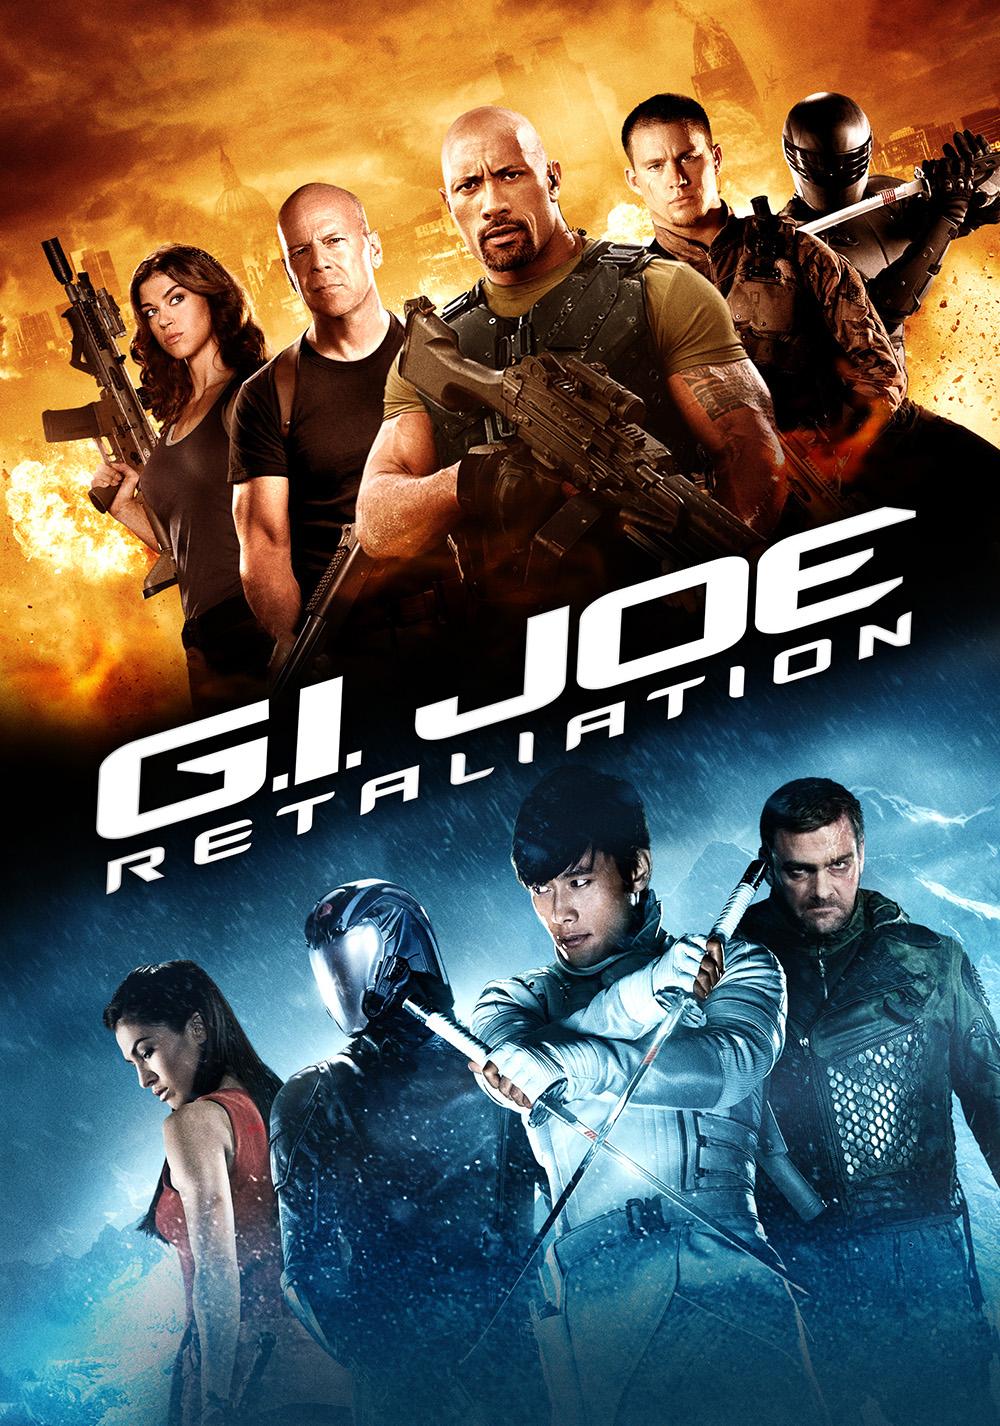 g.i. joe: retaliation | movie fanart | fanart.tv